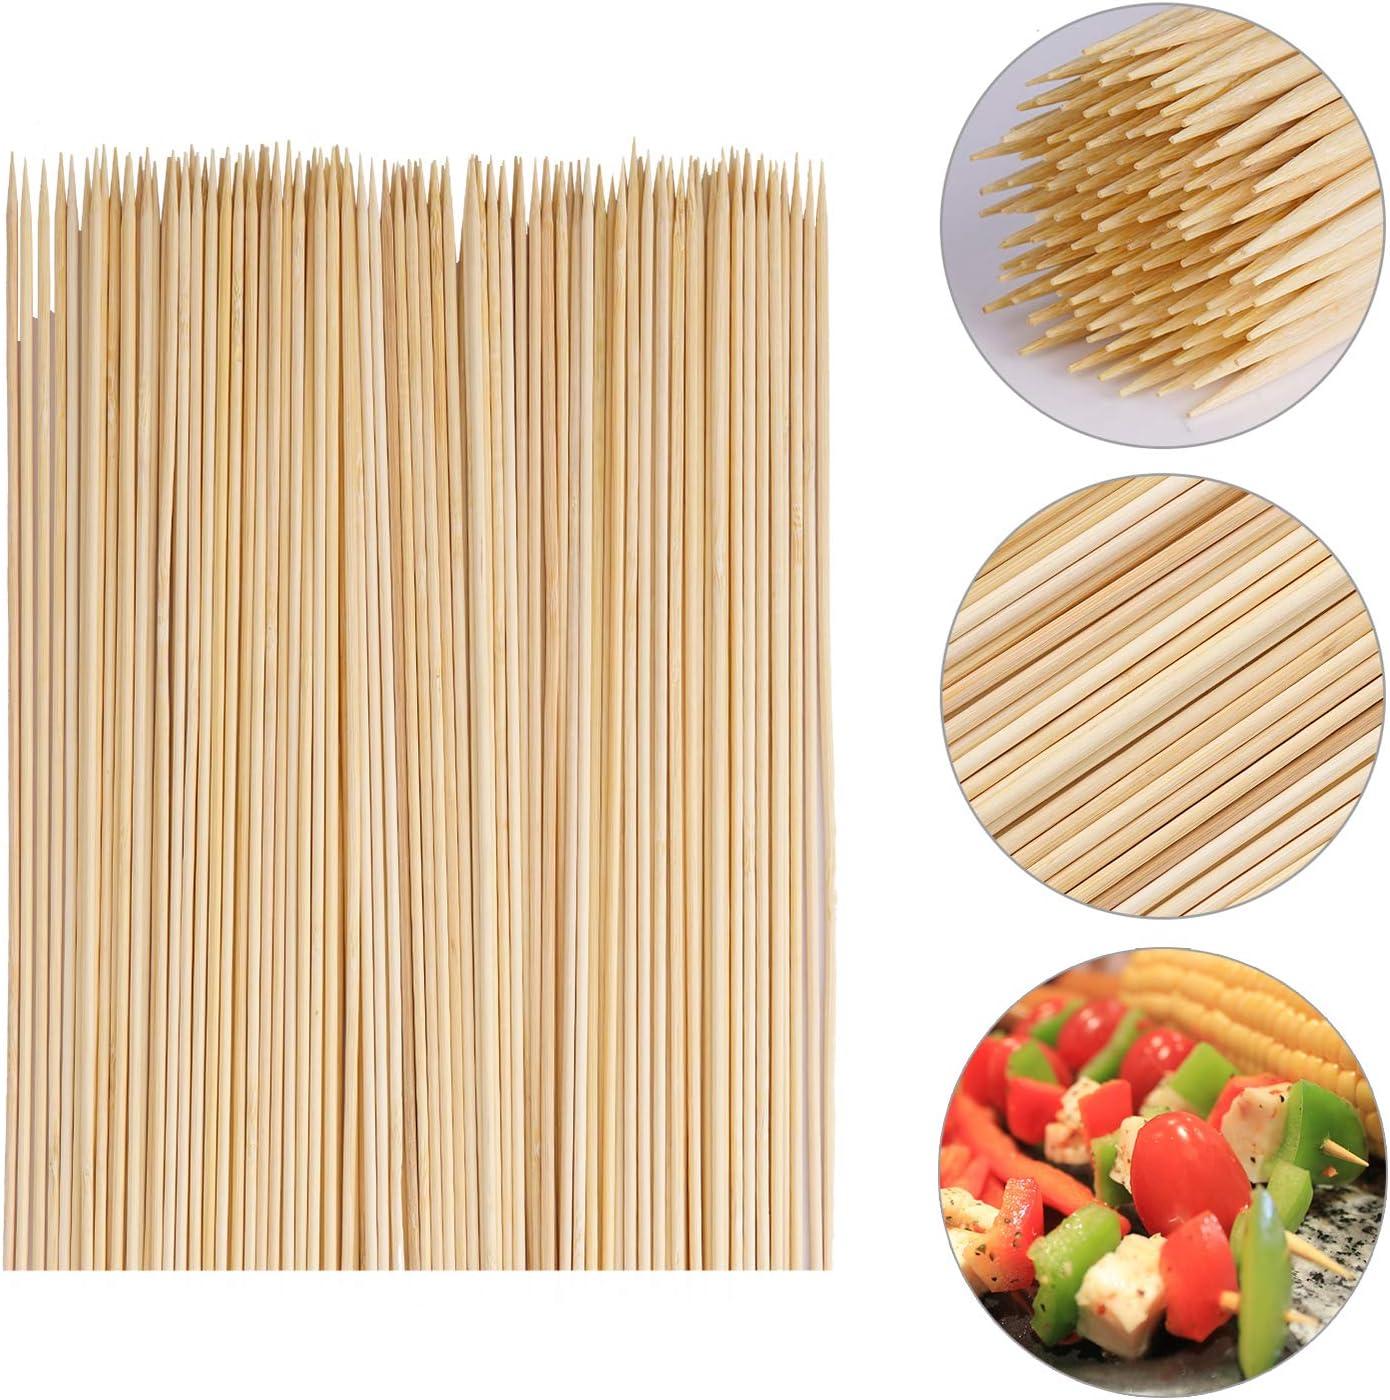 Spiedini di Legno di bamb/ù Naturale Grigliate CJMING 100PCS Spiedini di bamb/ù per Barbecue Bastoncini di Cottura Perfetti Frutta